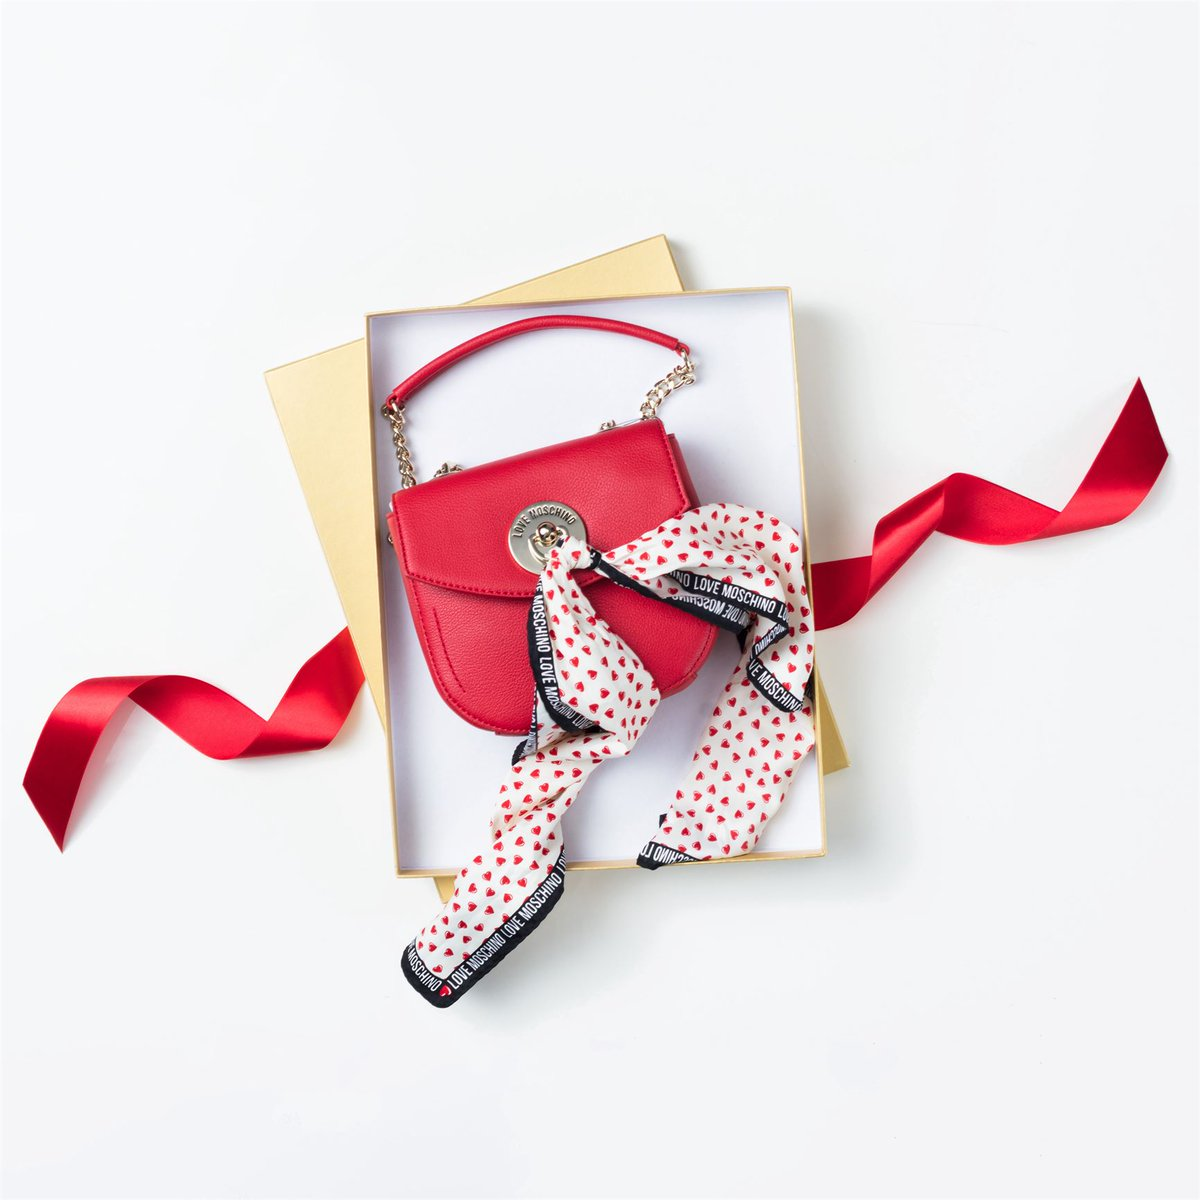 Подарок для неё #хц #подарокна8марта #LoveMoschino #моднаямаленькаясумка #краснаясумкаpic.twitter.com/Ta62oBtef5